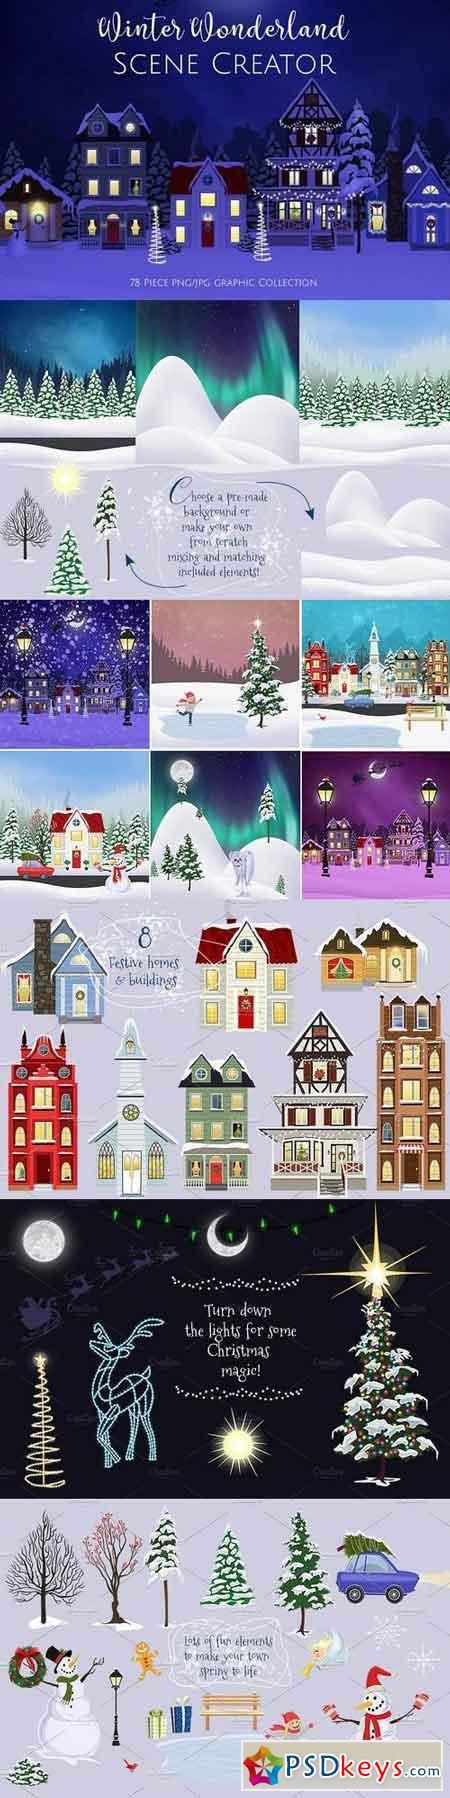 Winter Wonderland Scene Creator 1982768